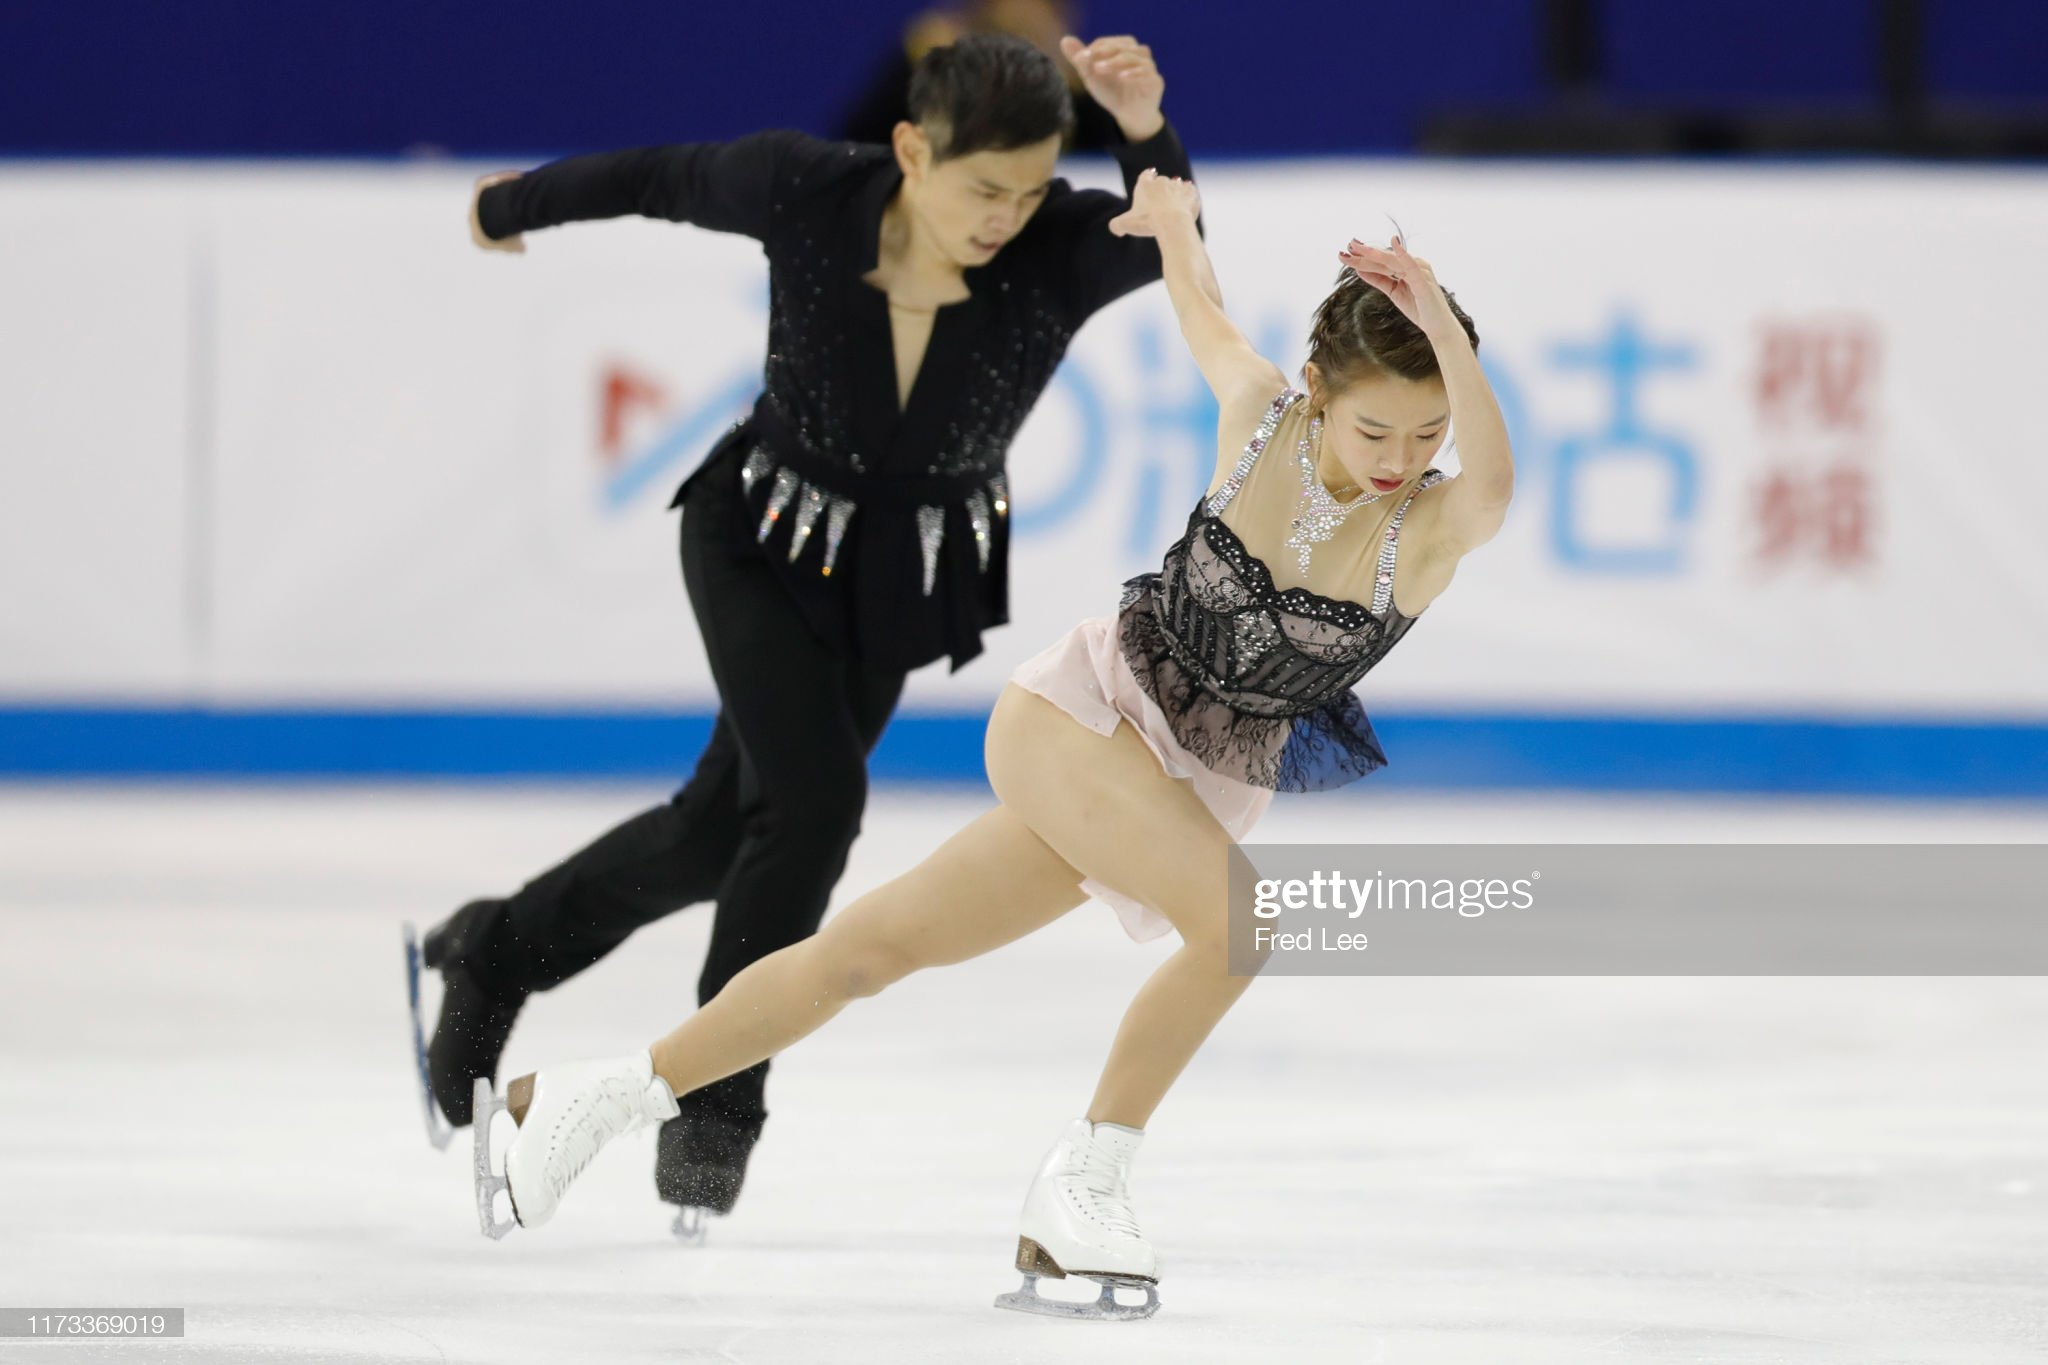 Shanghai Trophy (Invitational). 3-5 октября 2019. Шанхай (Китай) - Страница 3 Wanqi-ning-and-chao-wang-of-china-perform-in-the-pairs-short-program-picture-id1173369019?s=2048x2048